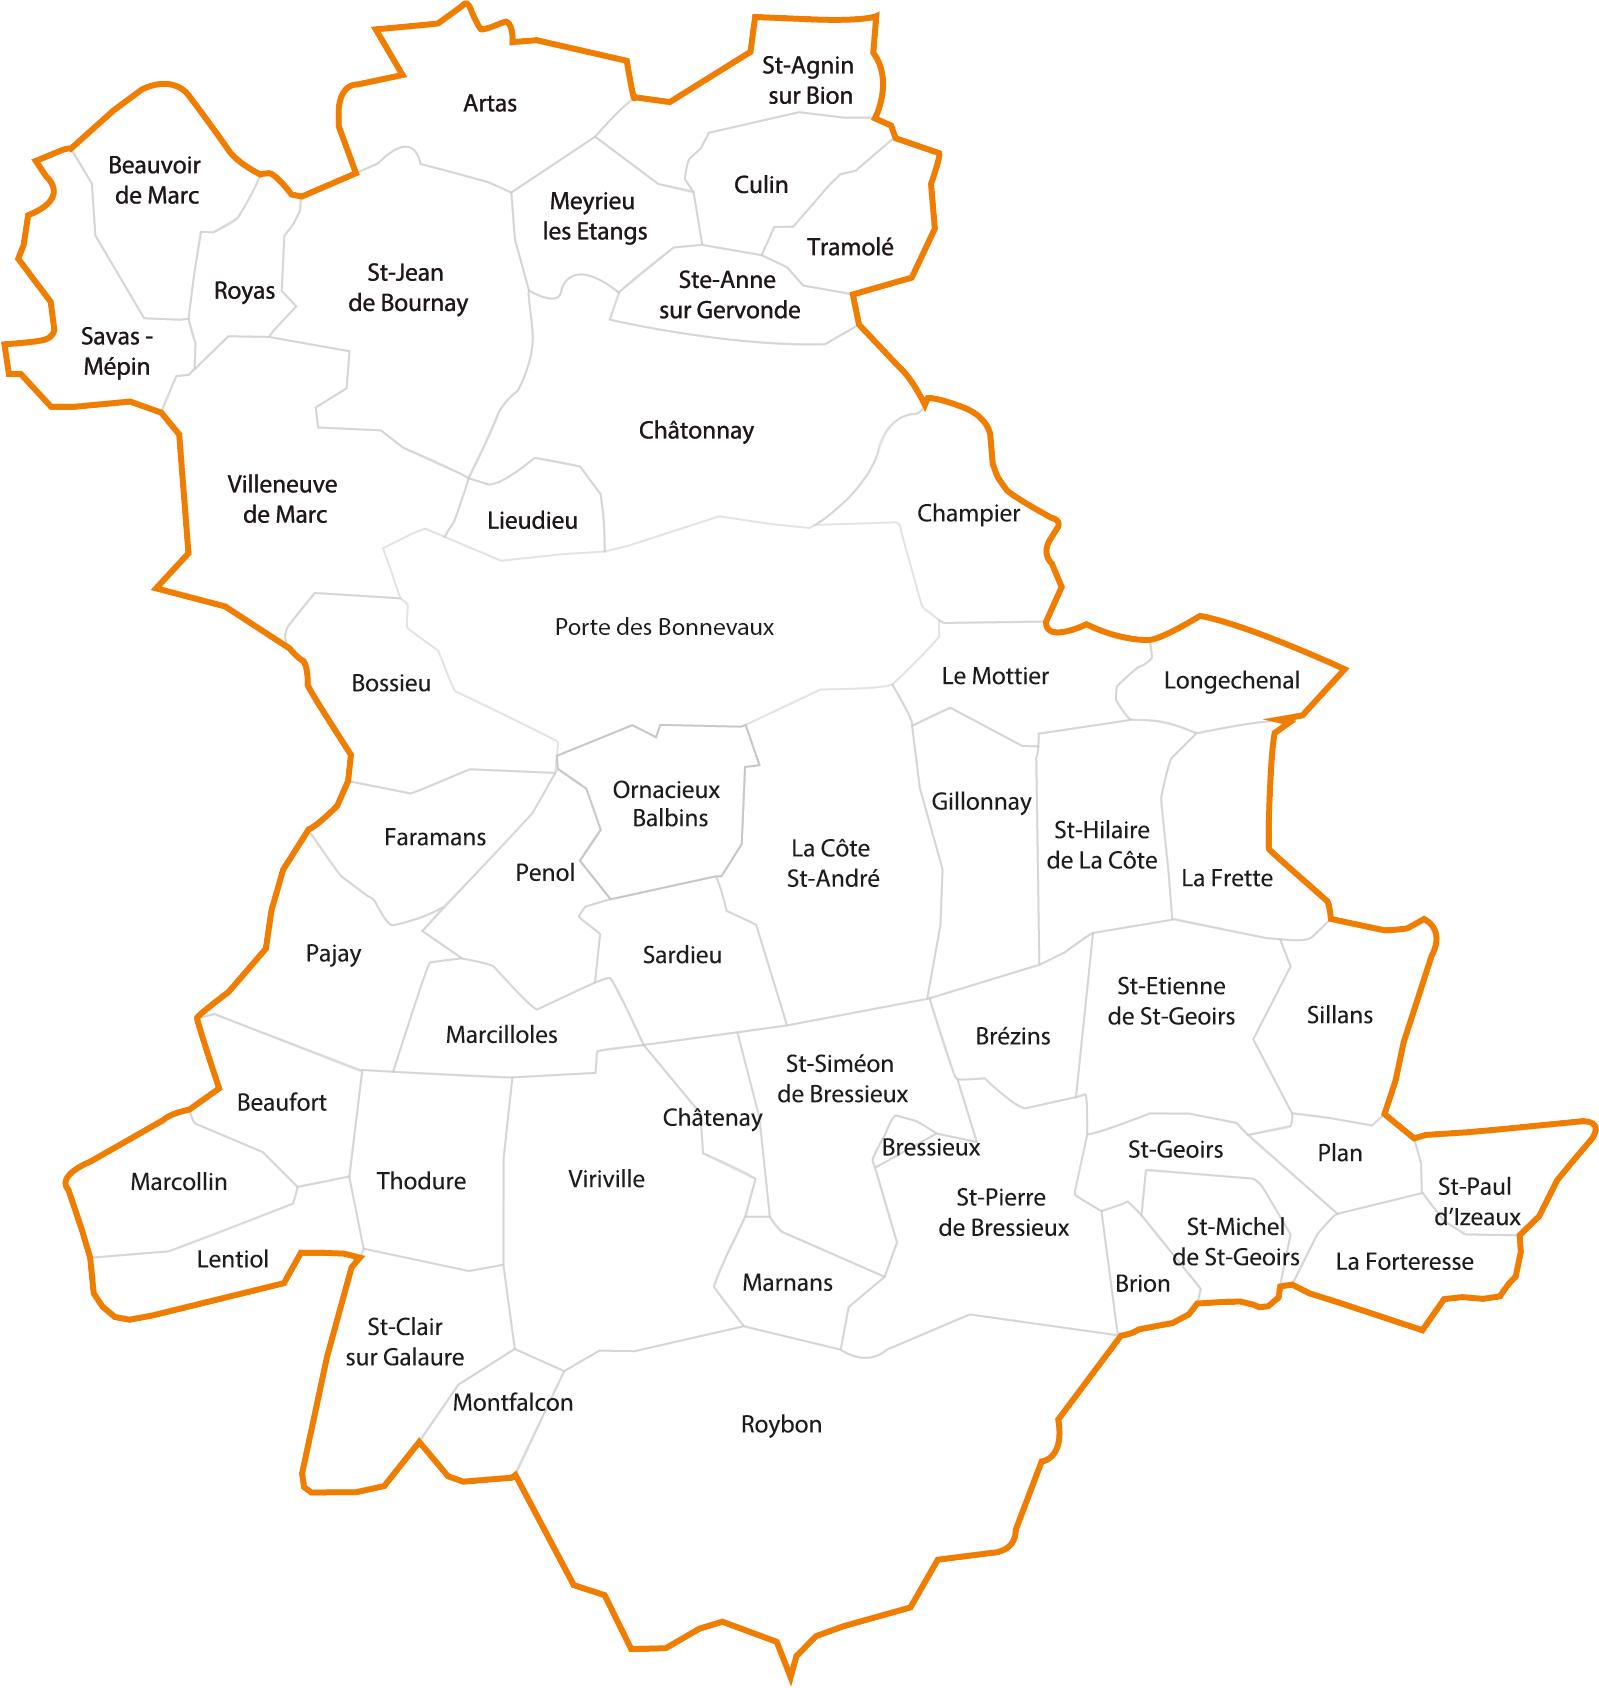 carte-Bievre-Isere-Communaute-2019.png